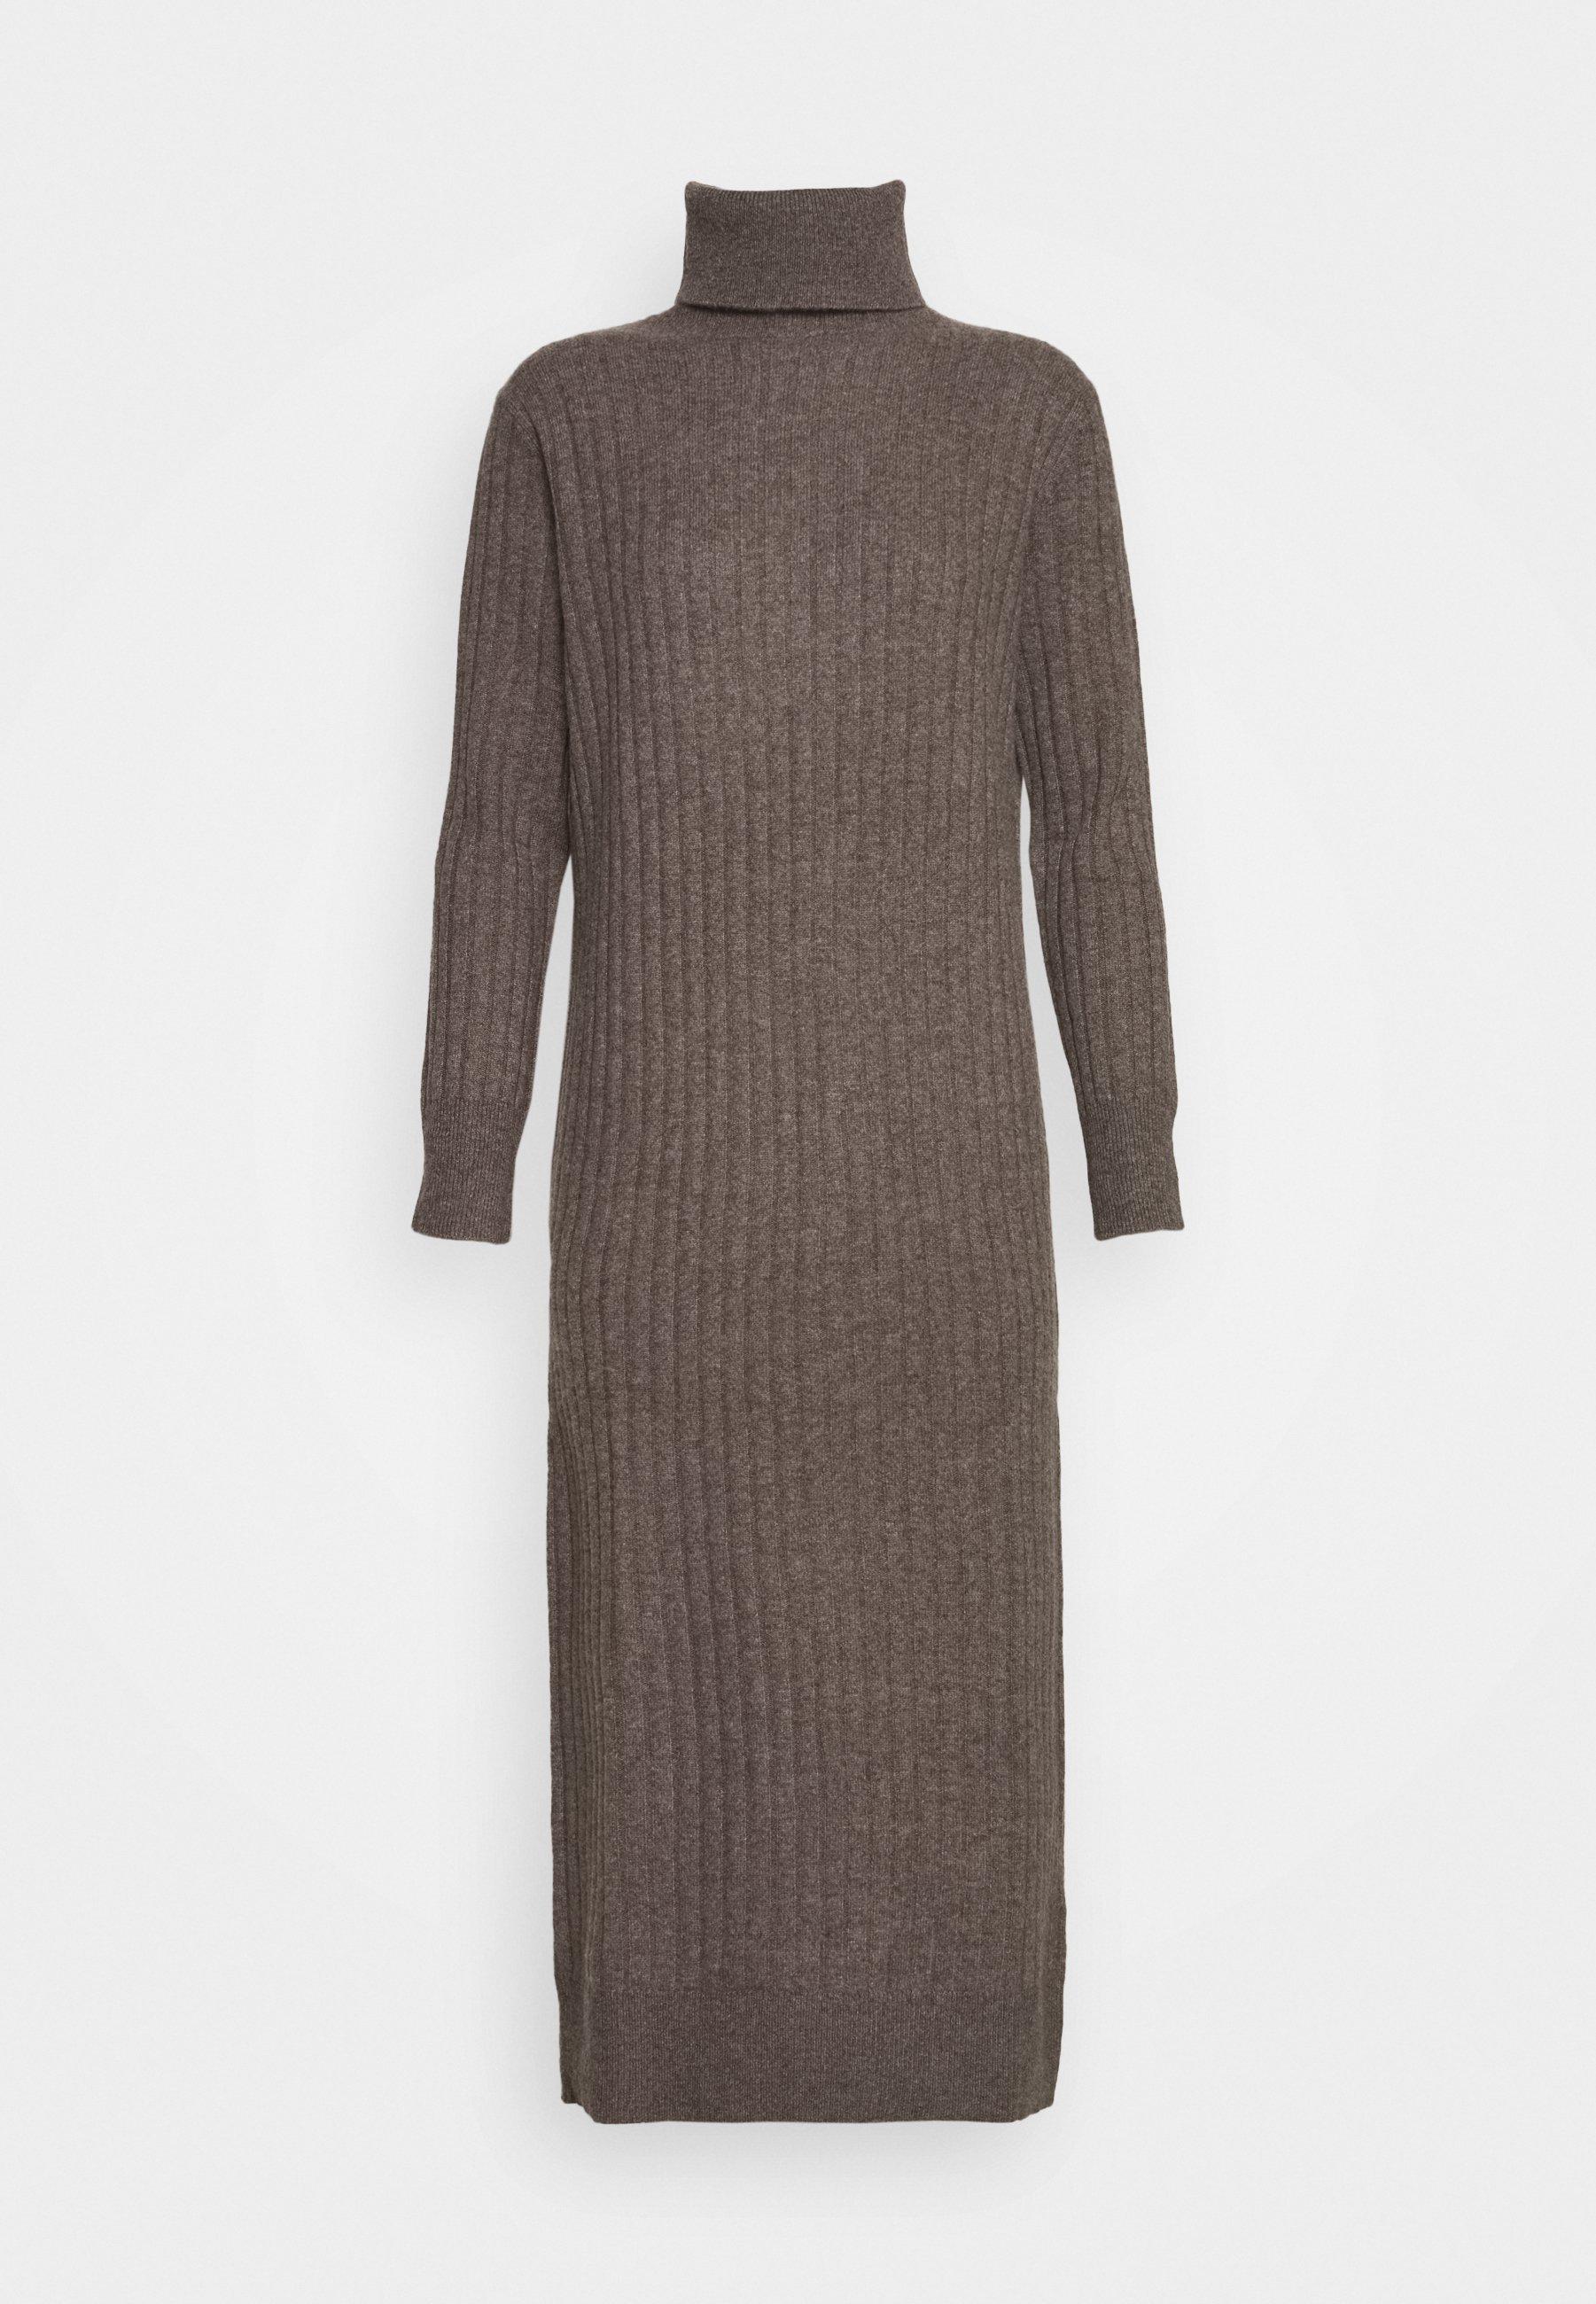 pure cashmere TURTLENECK DRESS Gebreide jurk heathered